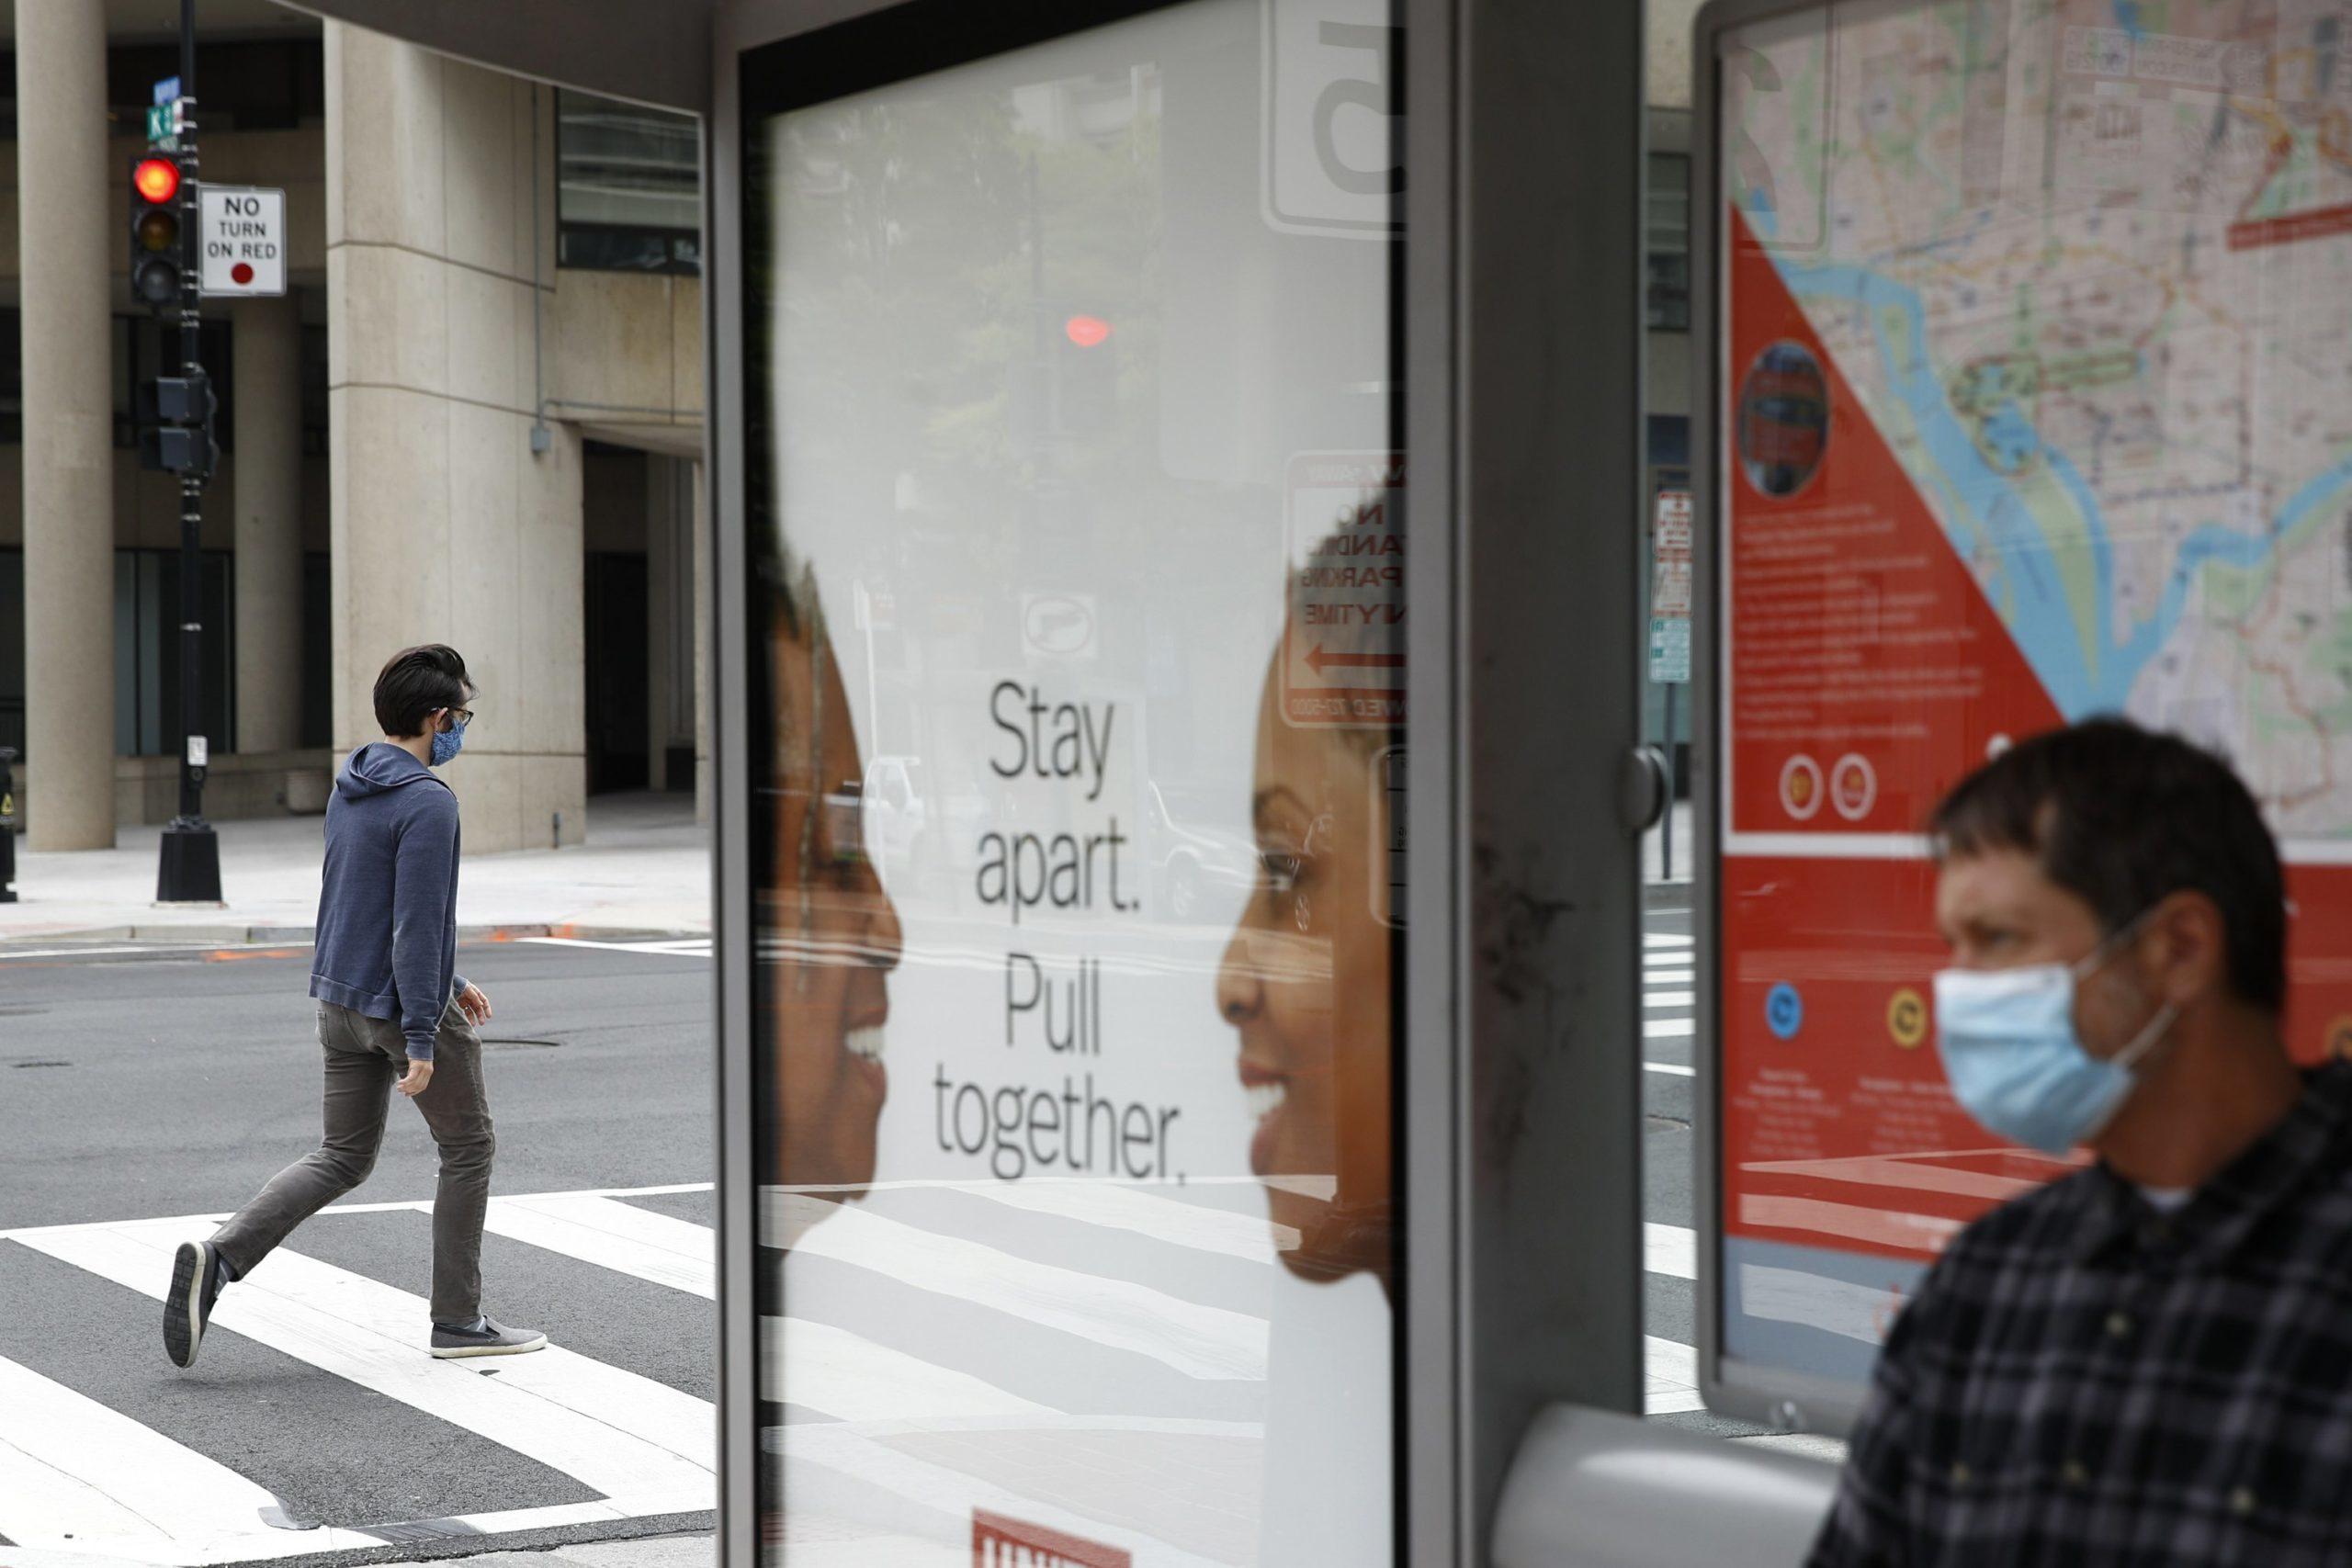 Coronavirus-triggered layoffs in US hit nearly 39 million 3